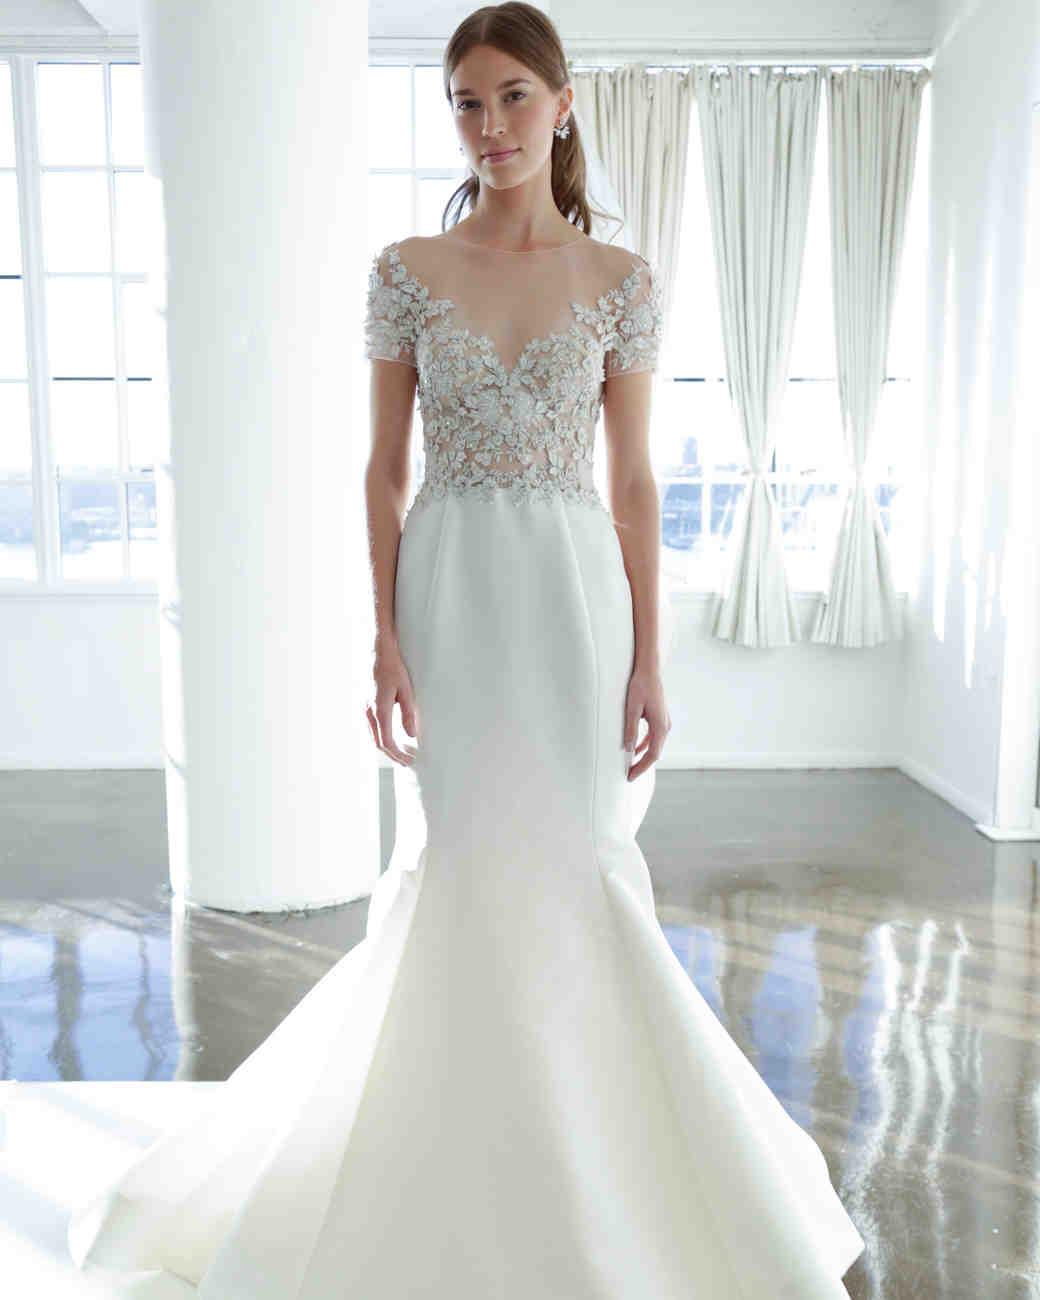 Vintage Wedding Dresses Nicole Richi